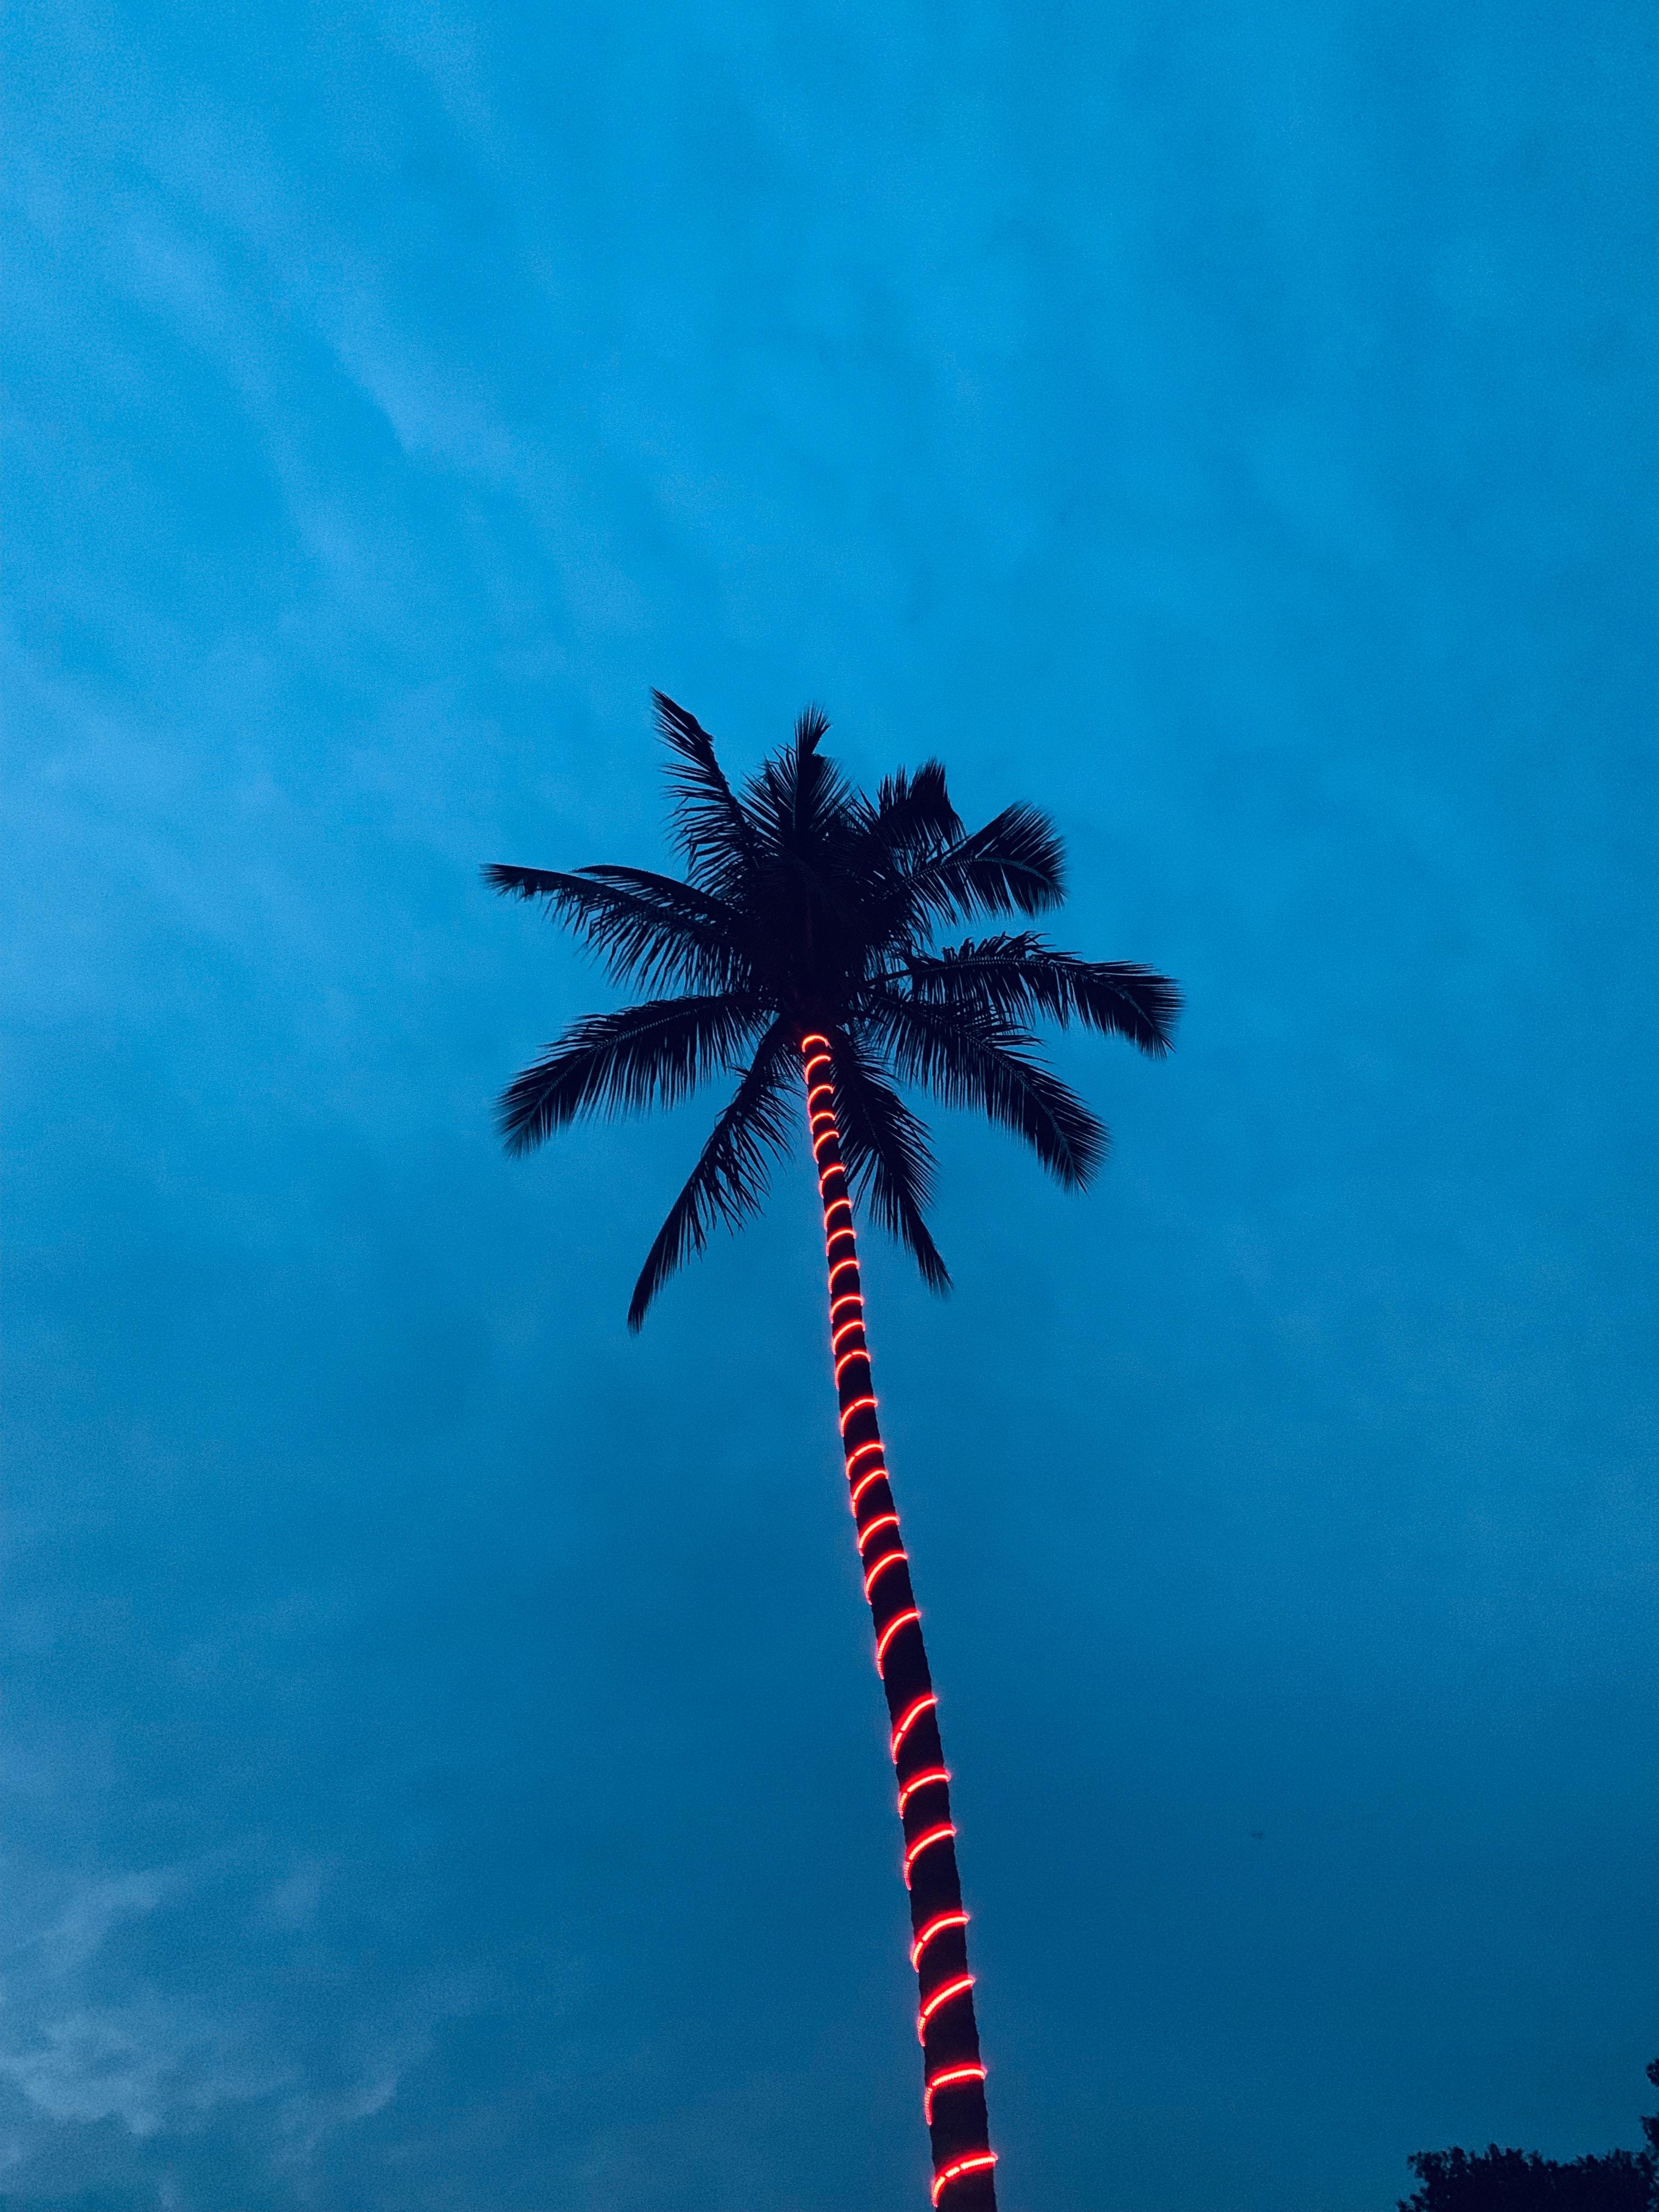 Grote boom verlichten palmboom